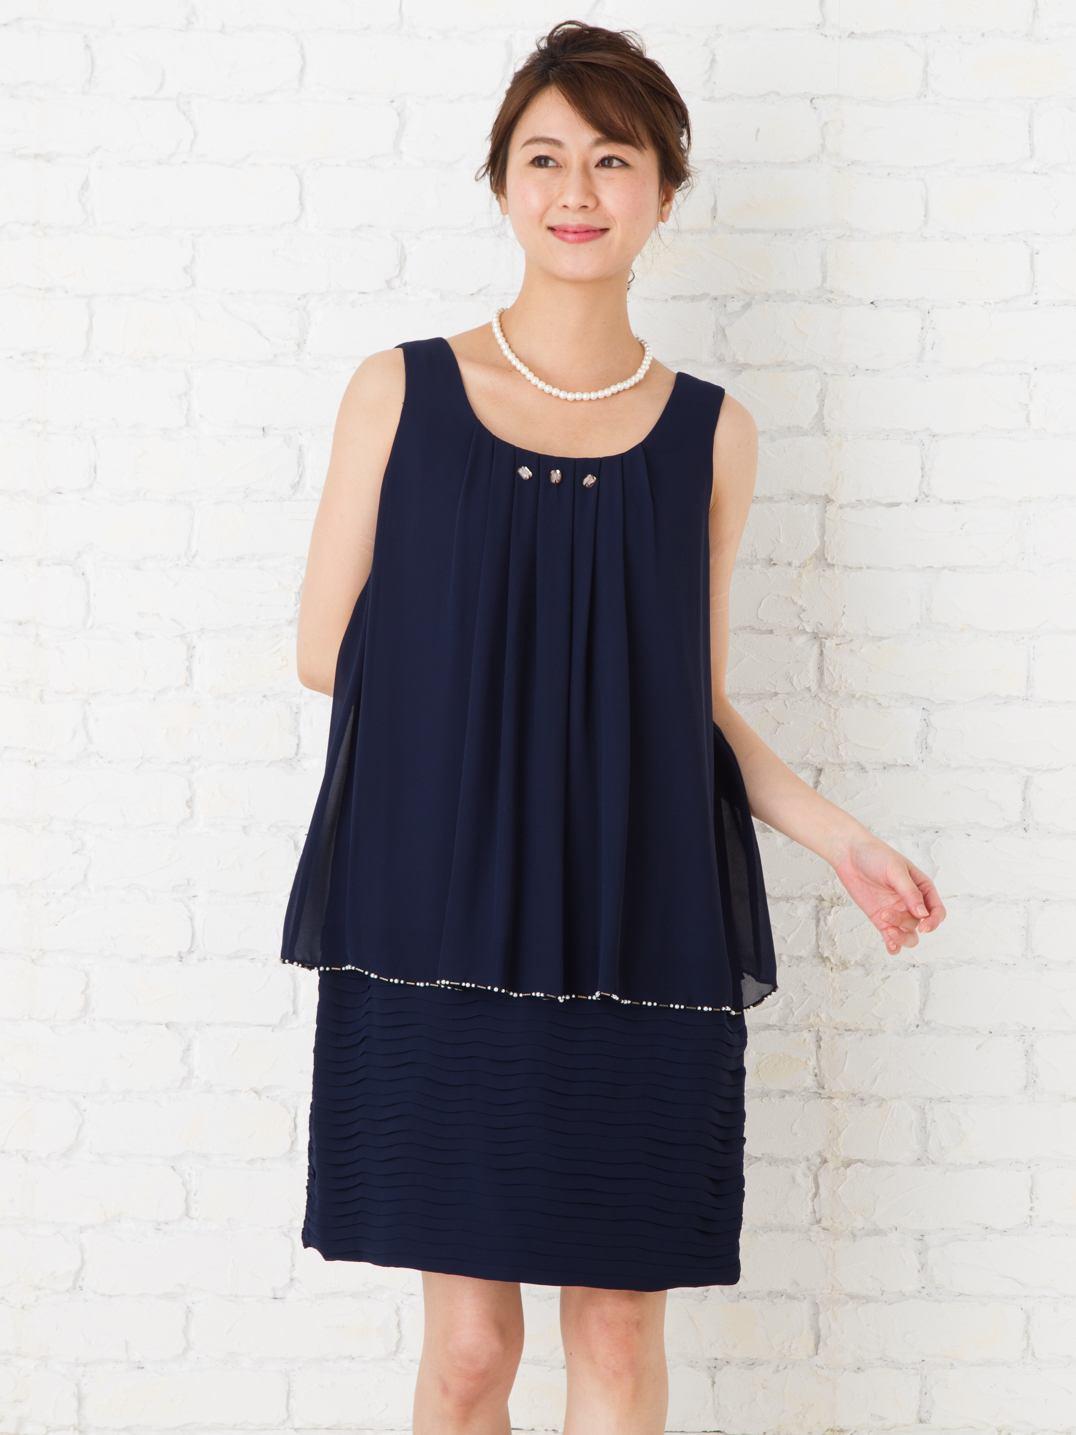 Jines ドレス / Mサイズ (DOC0003)